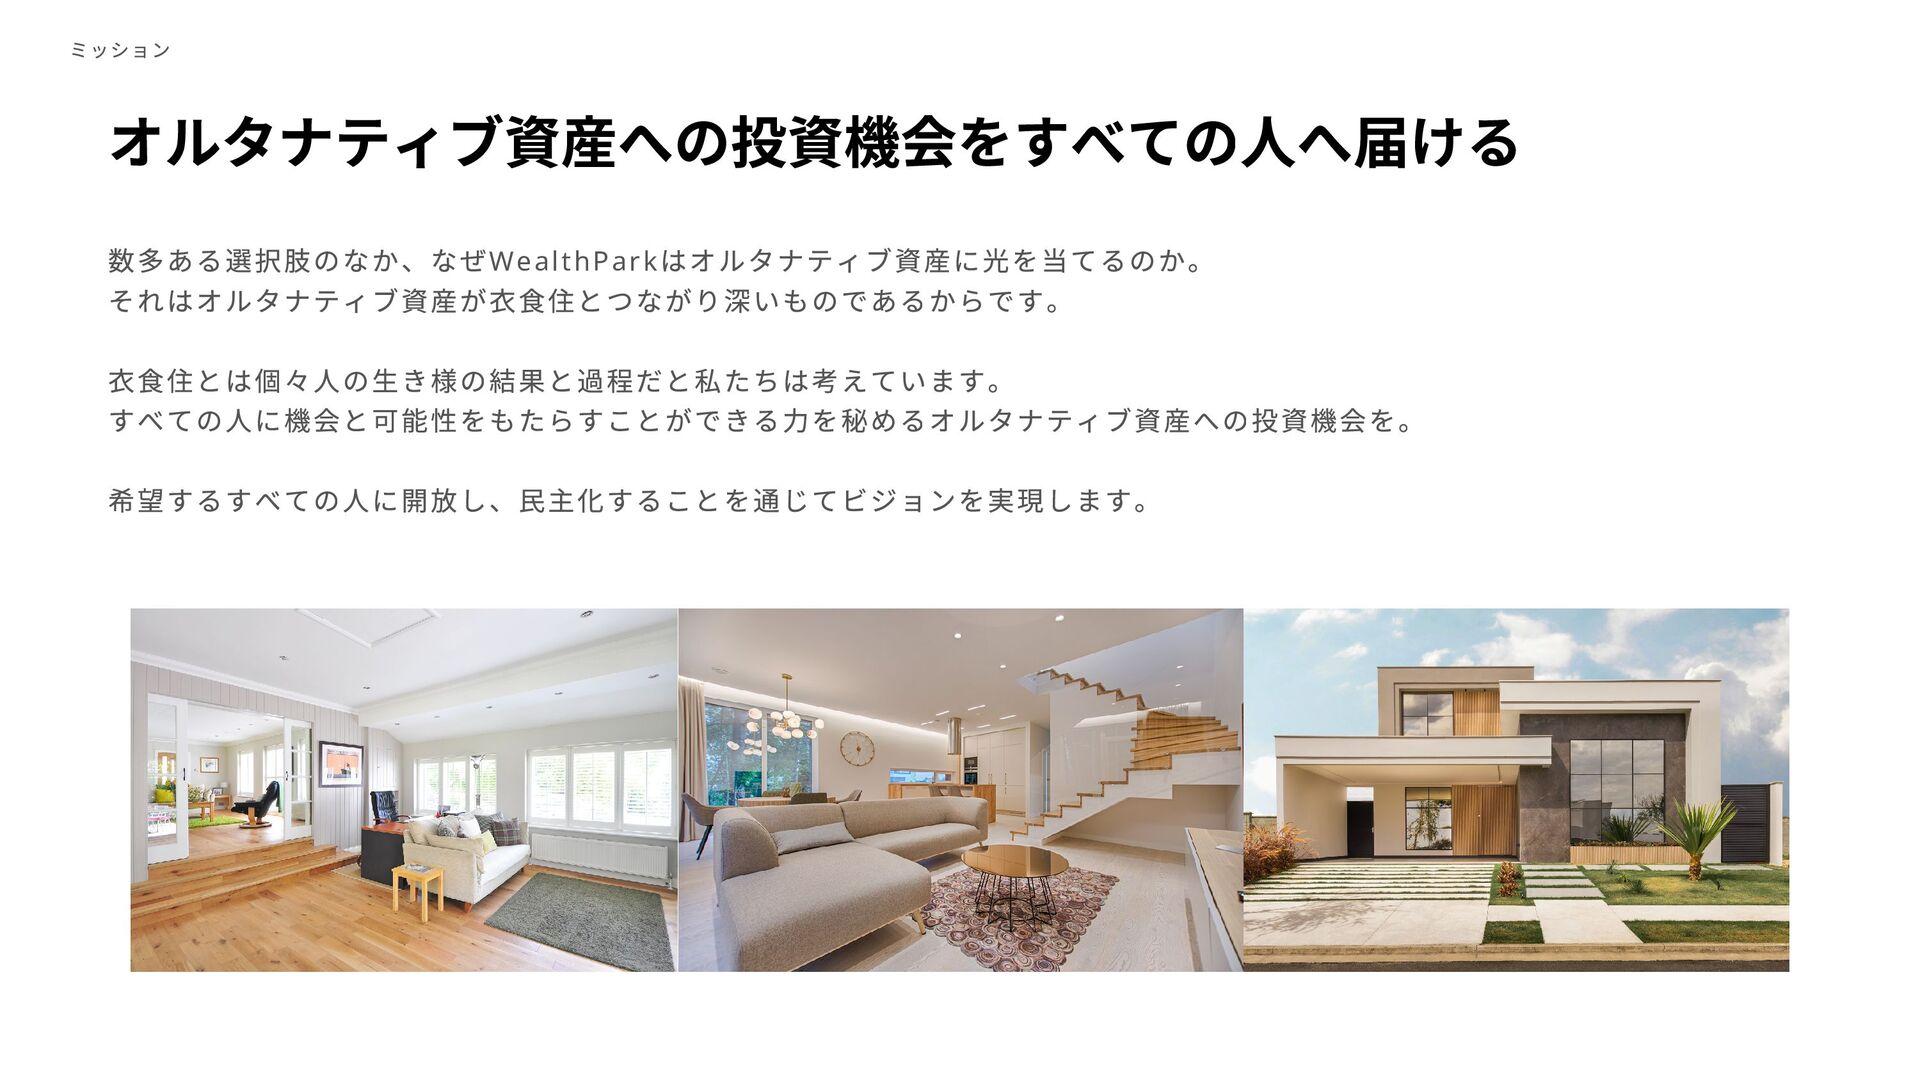 5 Ԋֵ History © 2021 WealthPark Co., Ltd. 7݄ ΞδΞ...